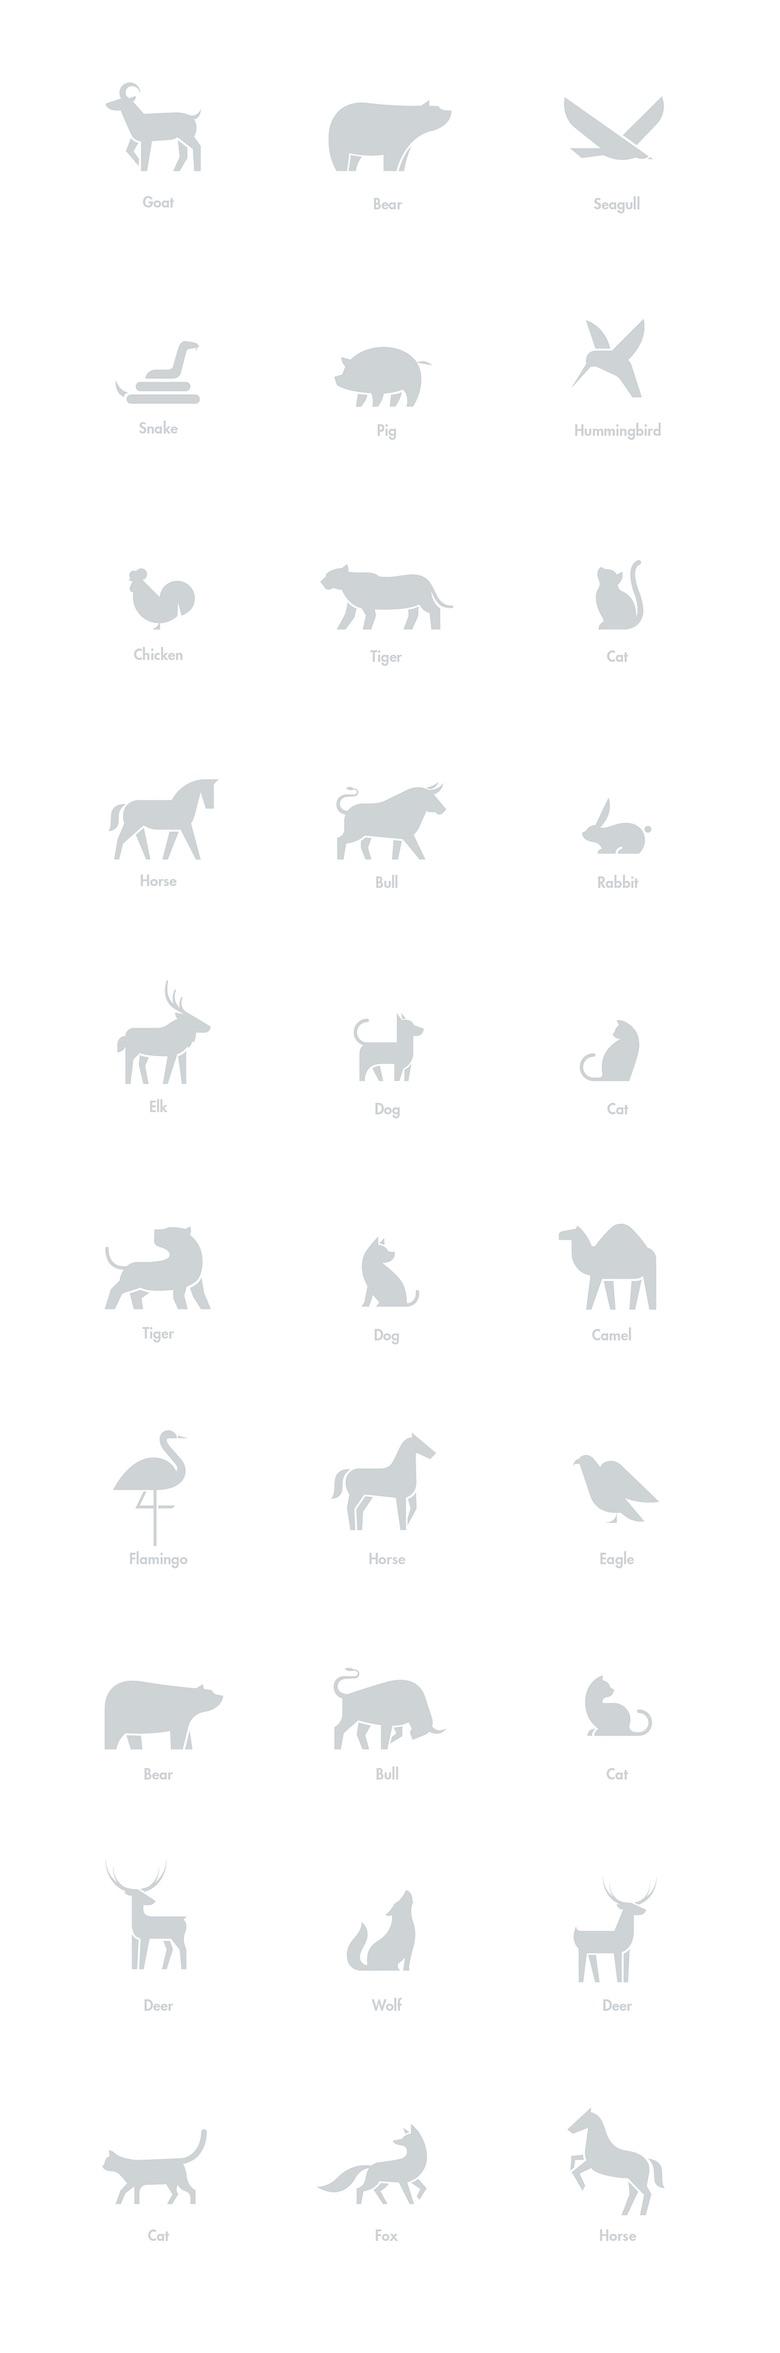 Animal Logos - All